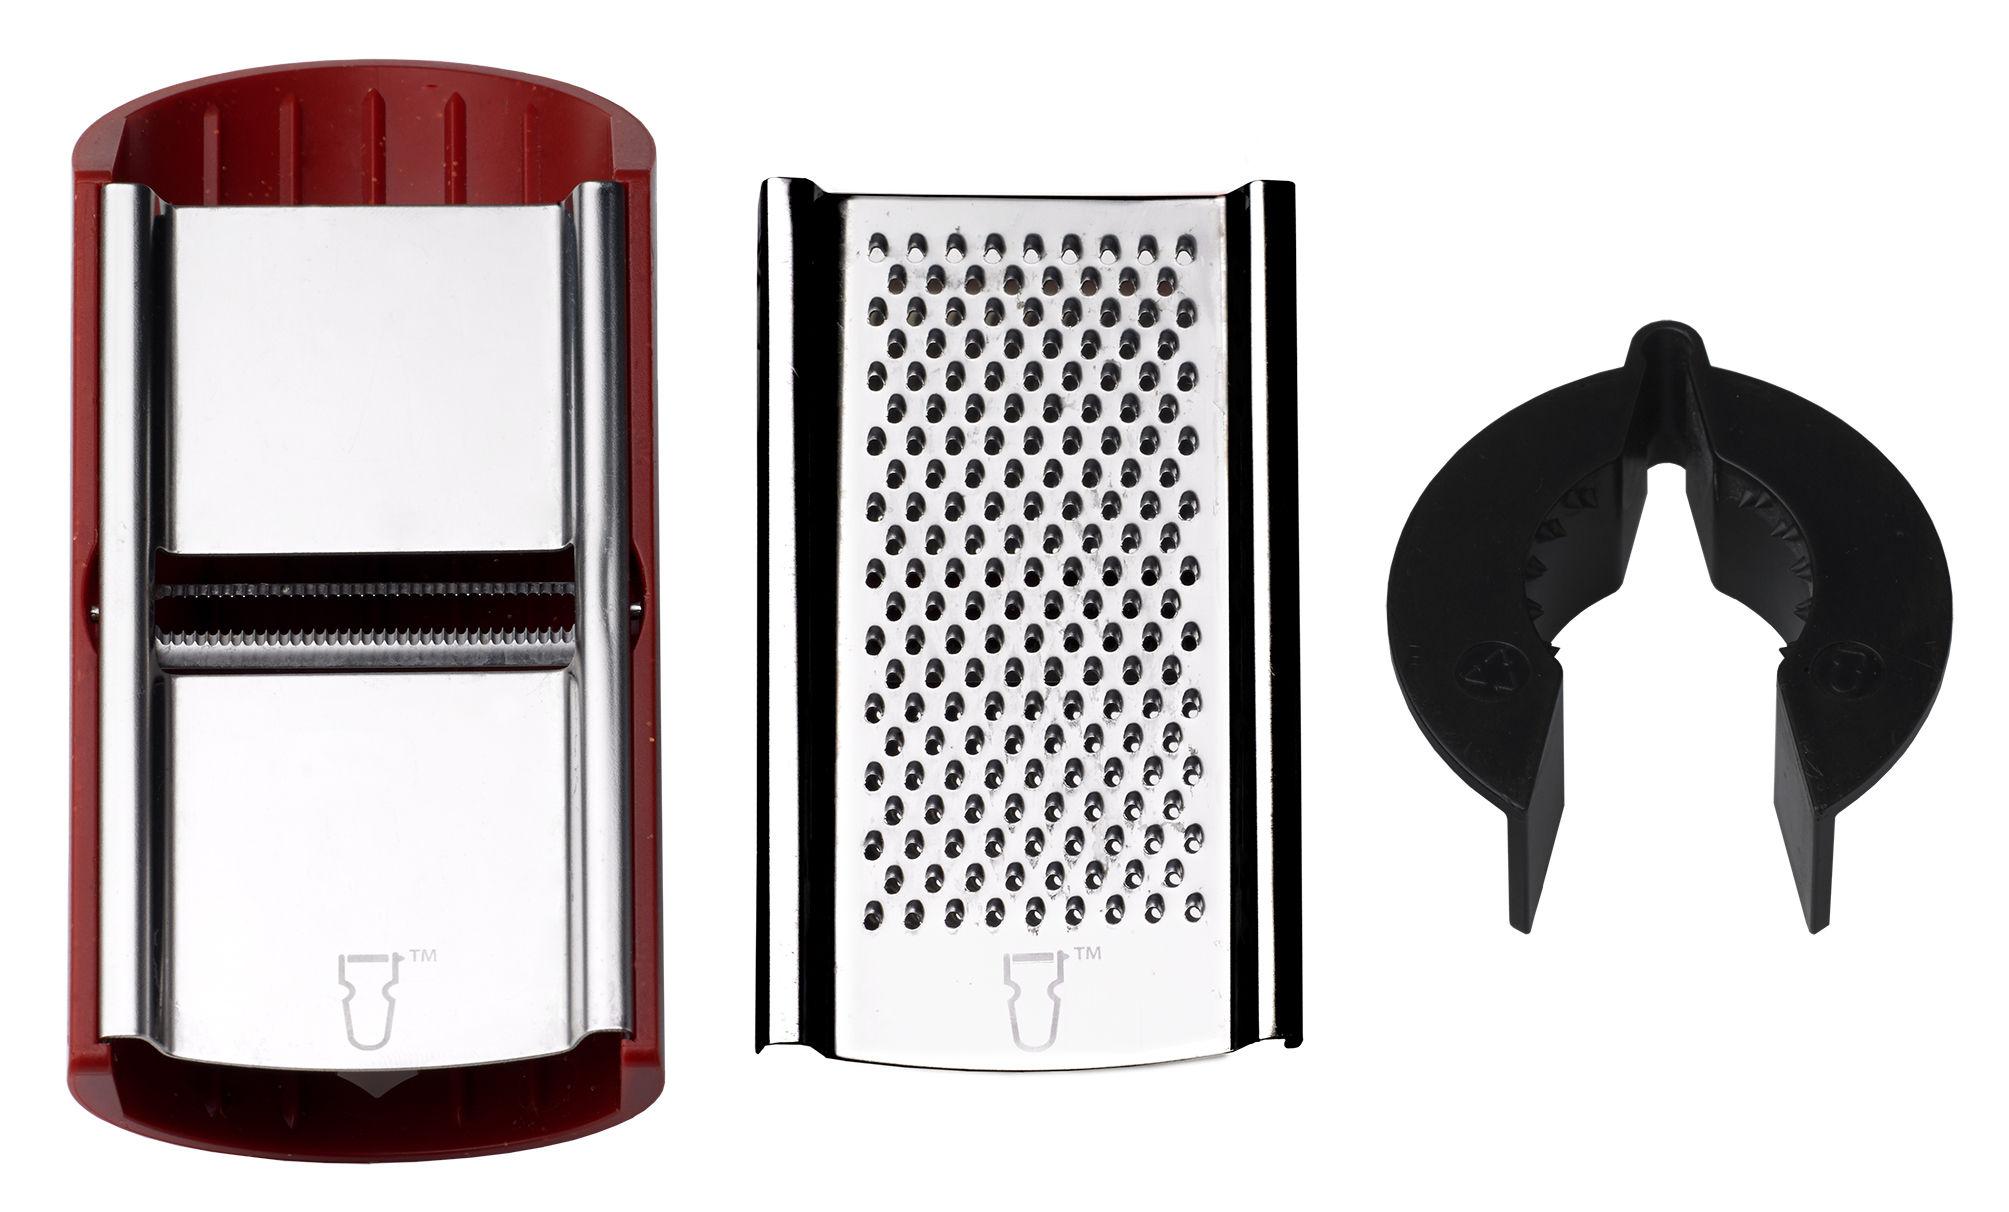 slicer red metal by malle w trousseau. Black Bedroom Furniture Sets. Home Design Ideas